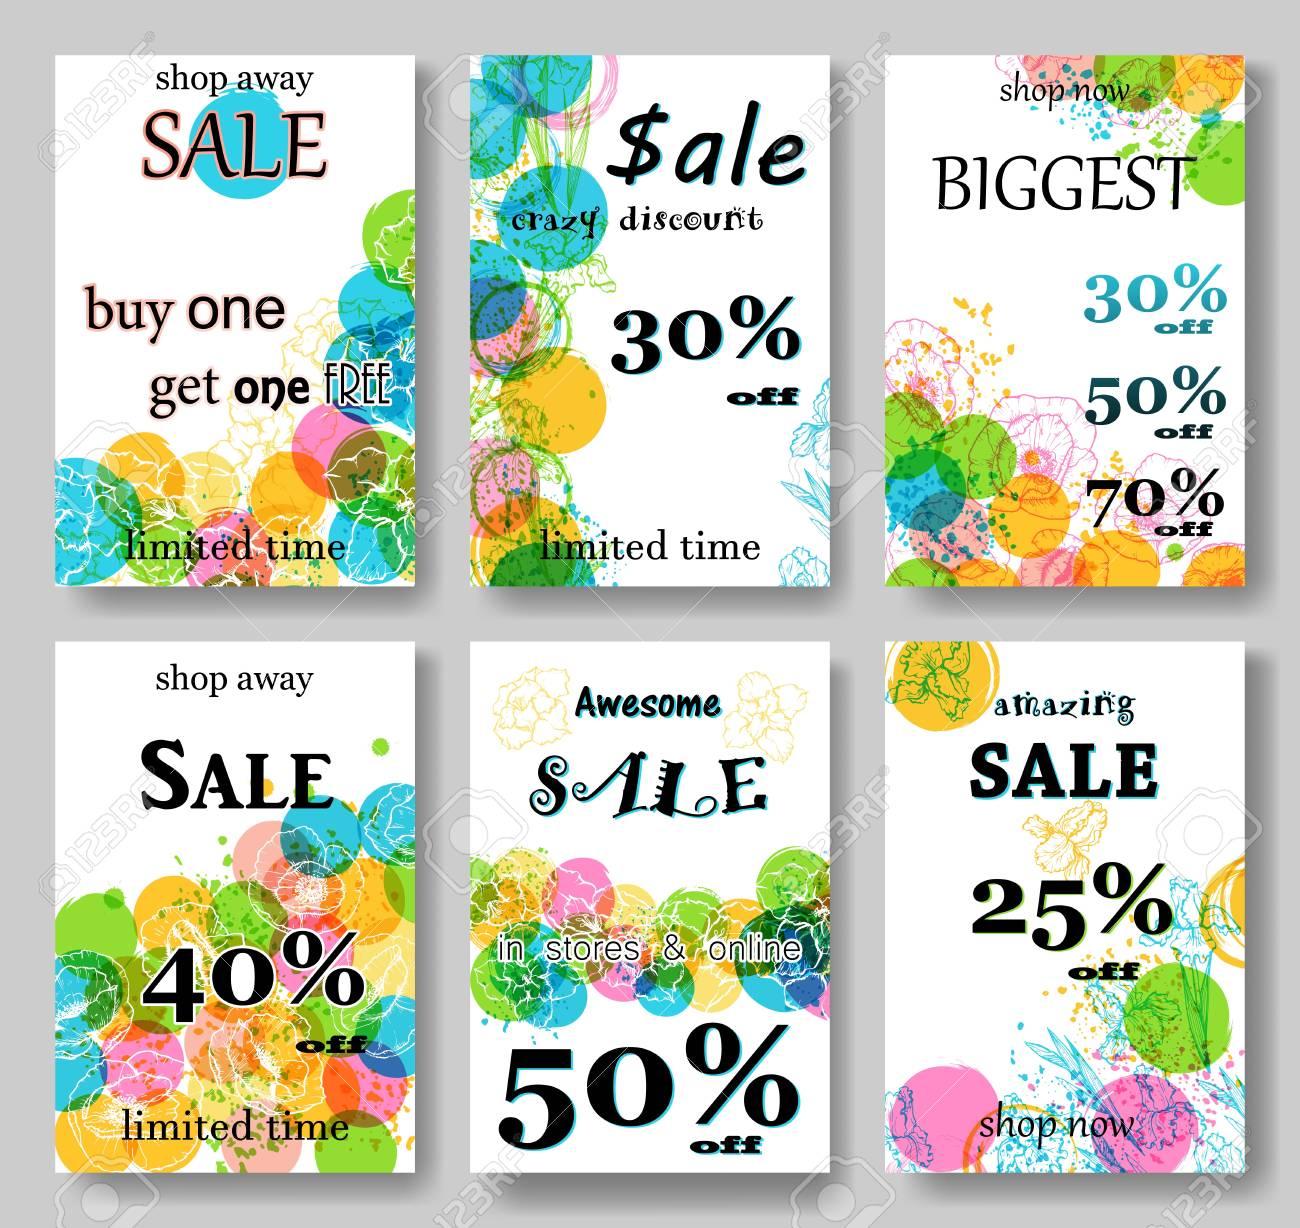 modern eye catching social media sale banners illustrations stock